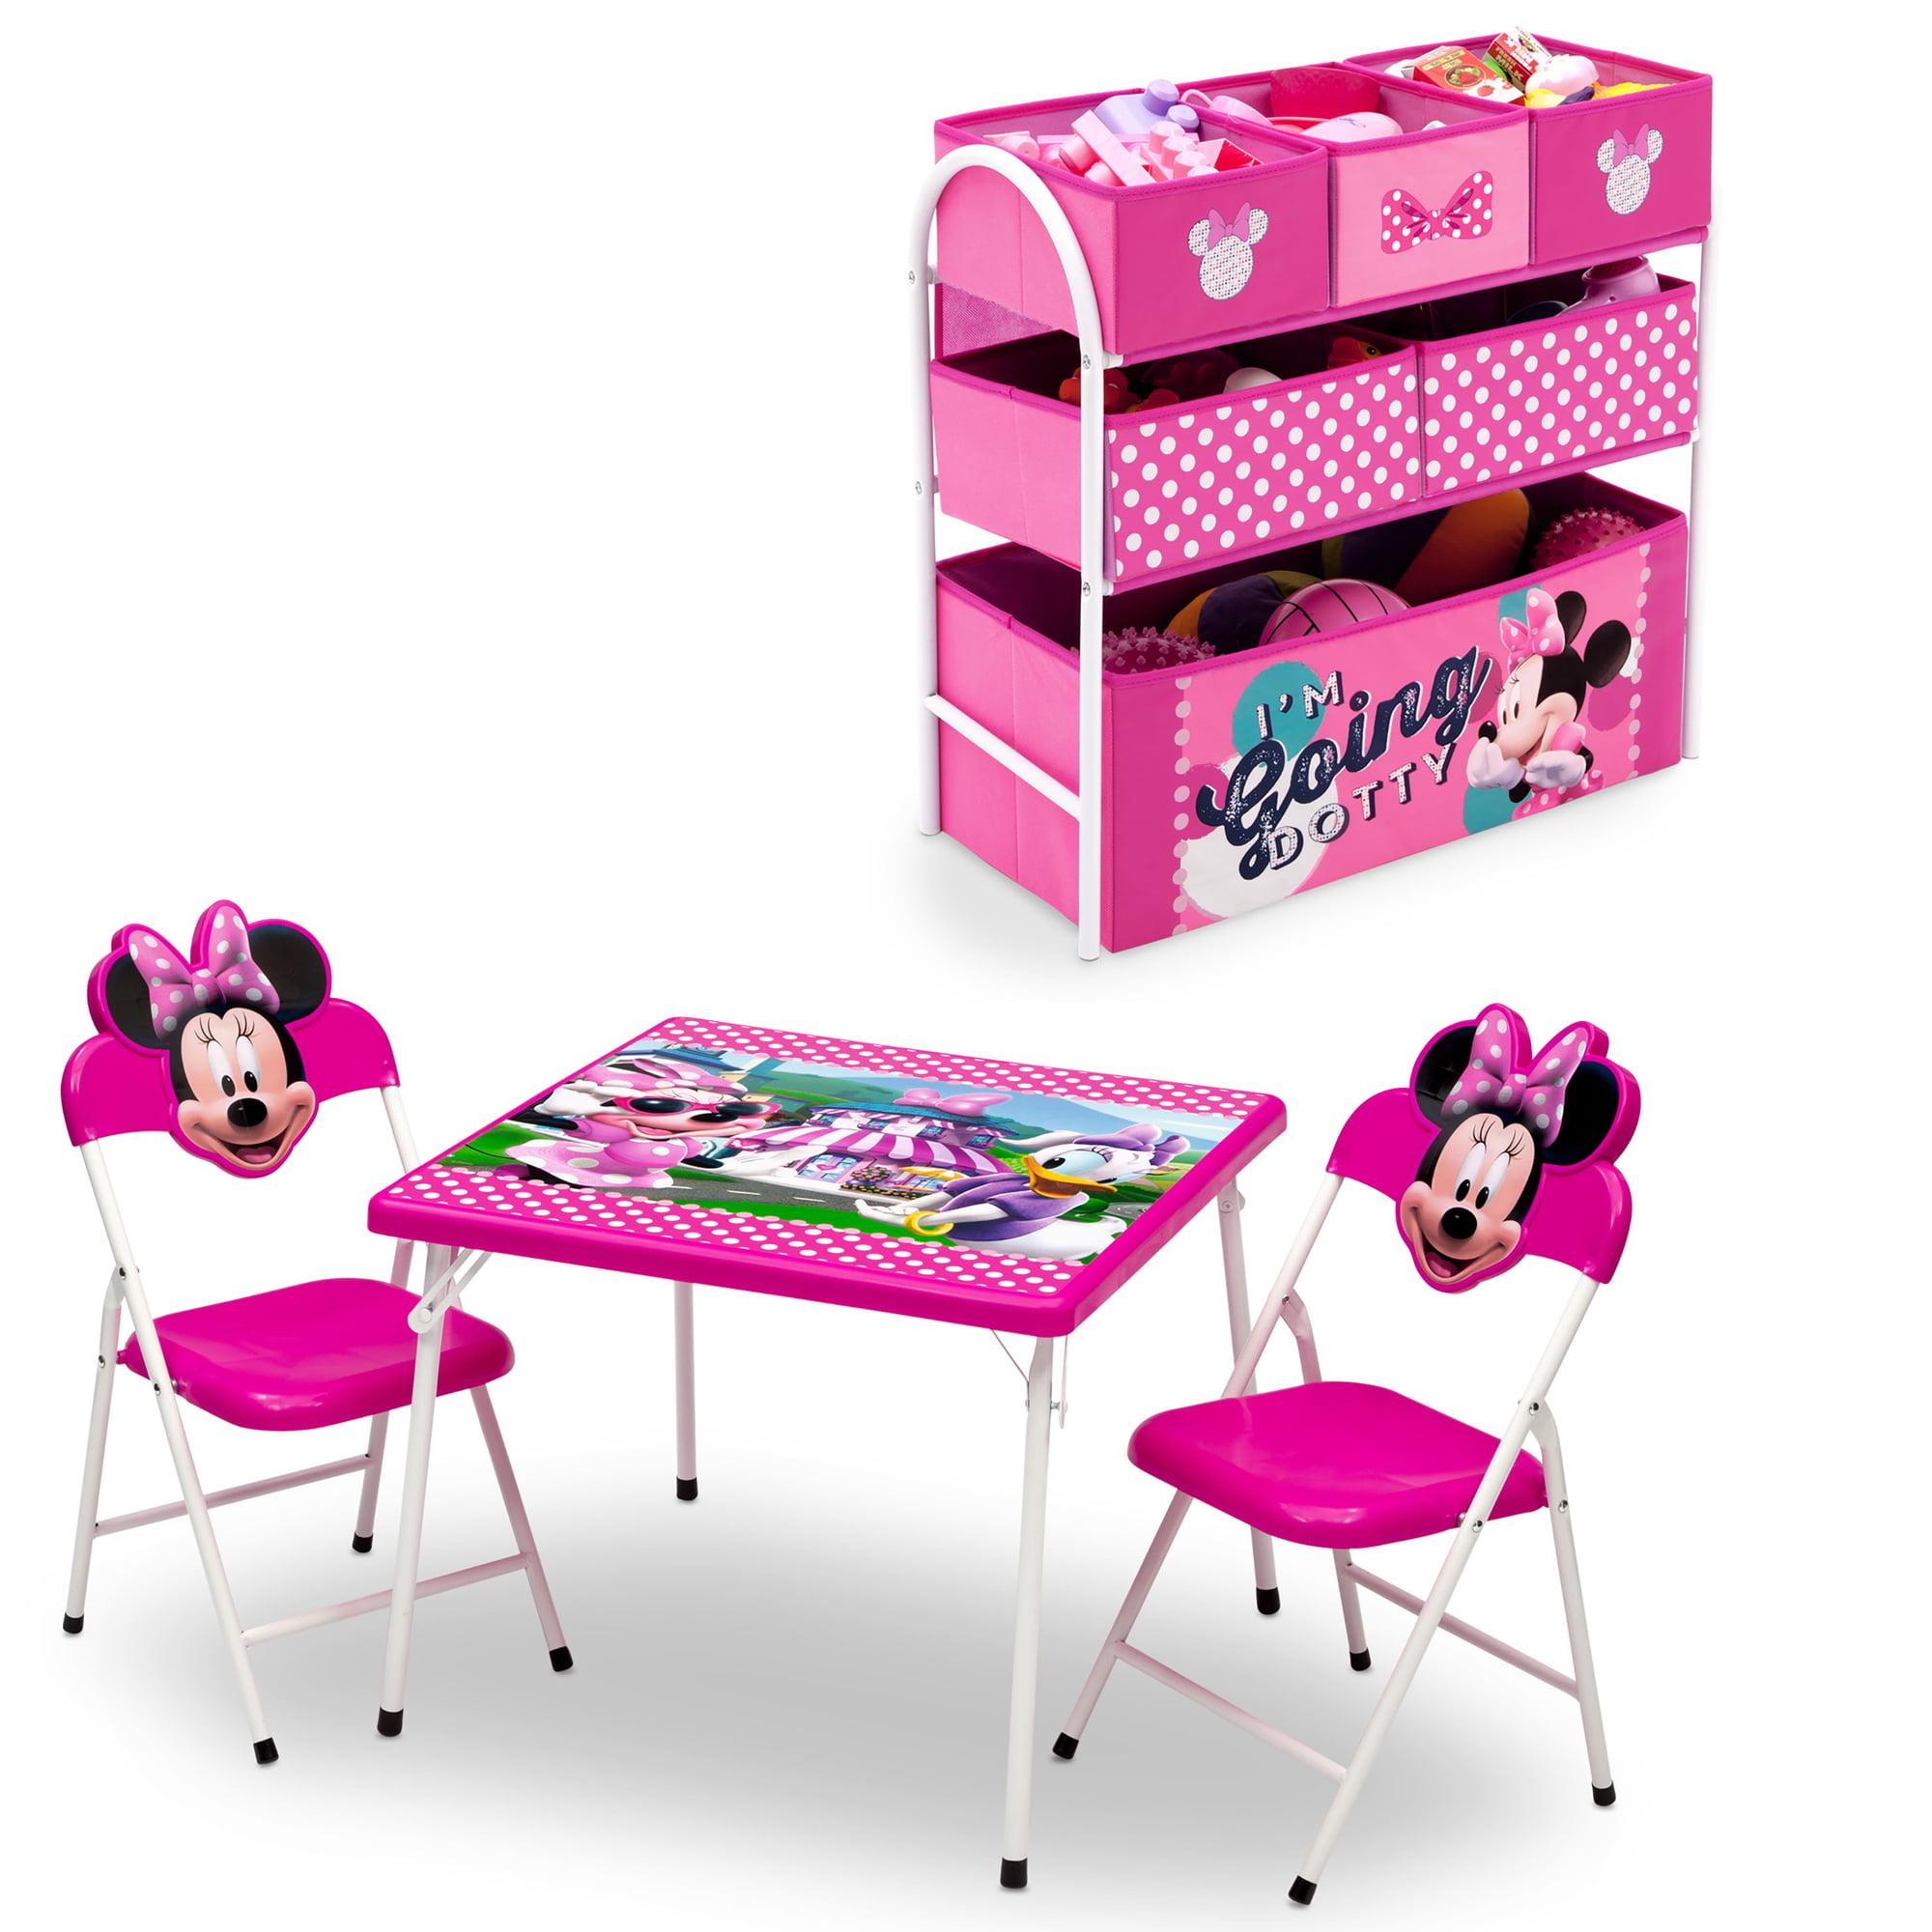 Disney Minnie Mouse 4-Piece Toddler Playroom Furniture Set by Delta Children